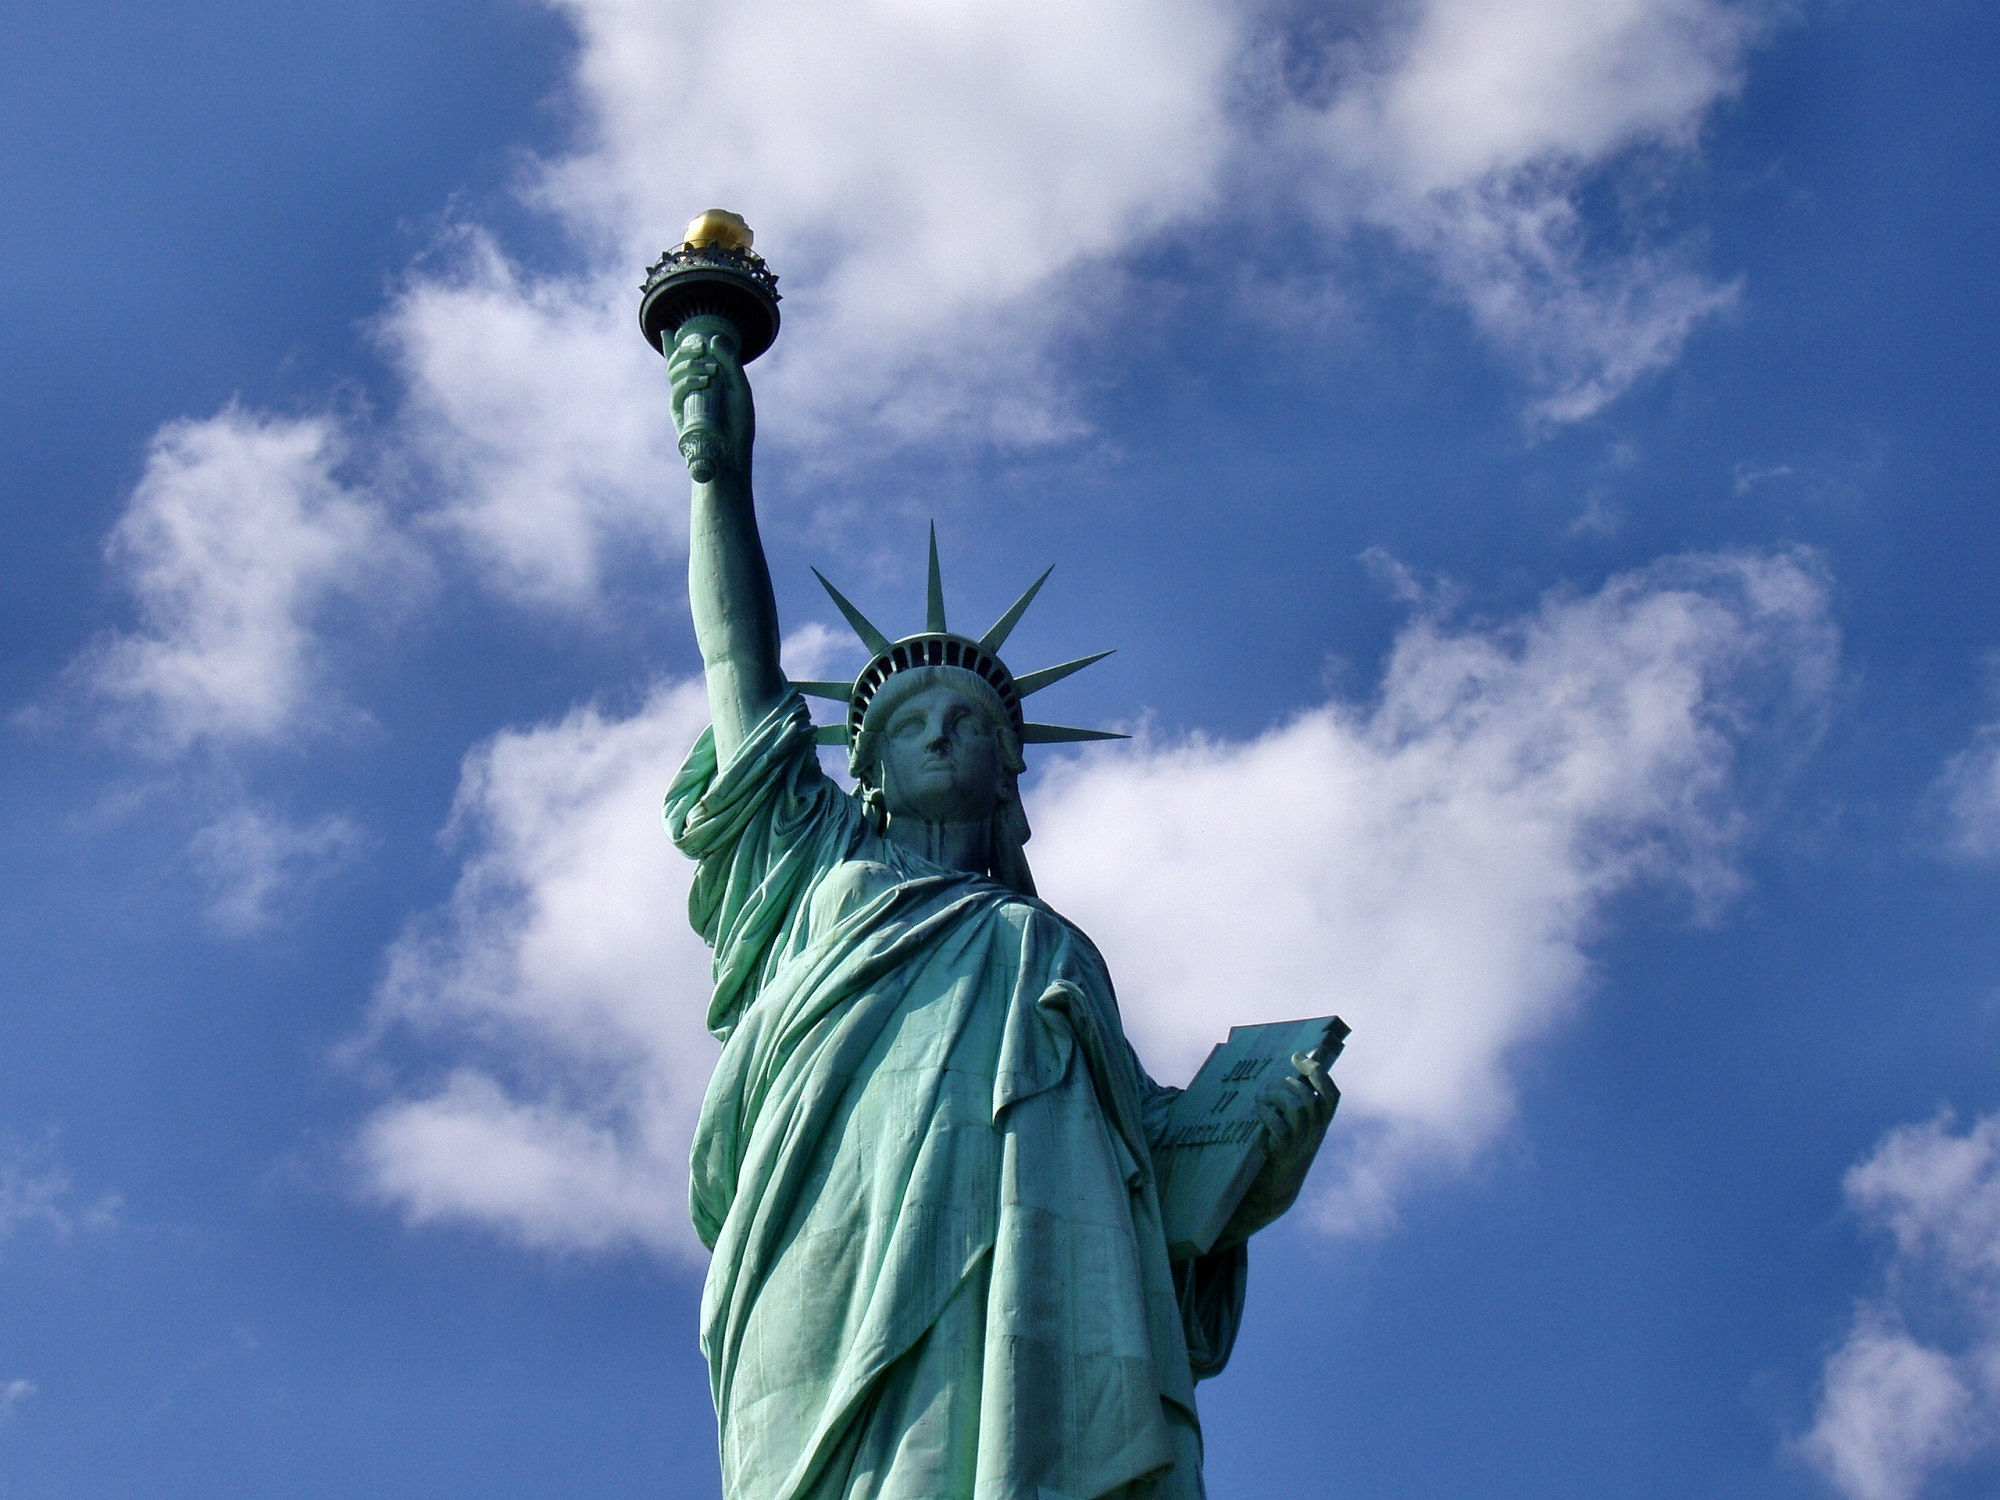 On patriotism and optimism